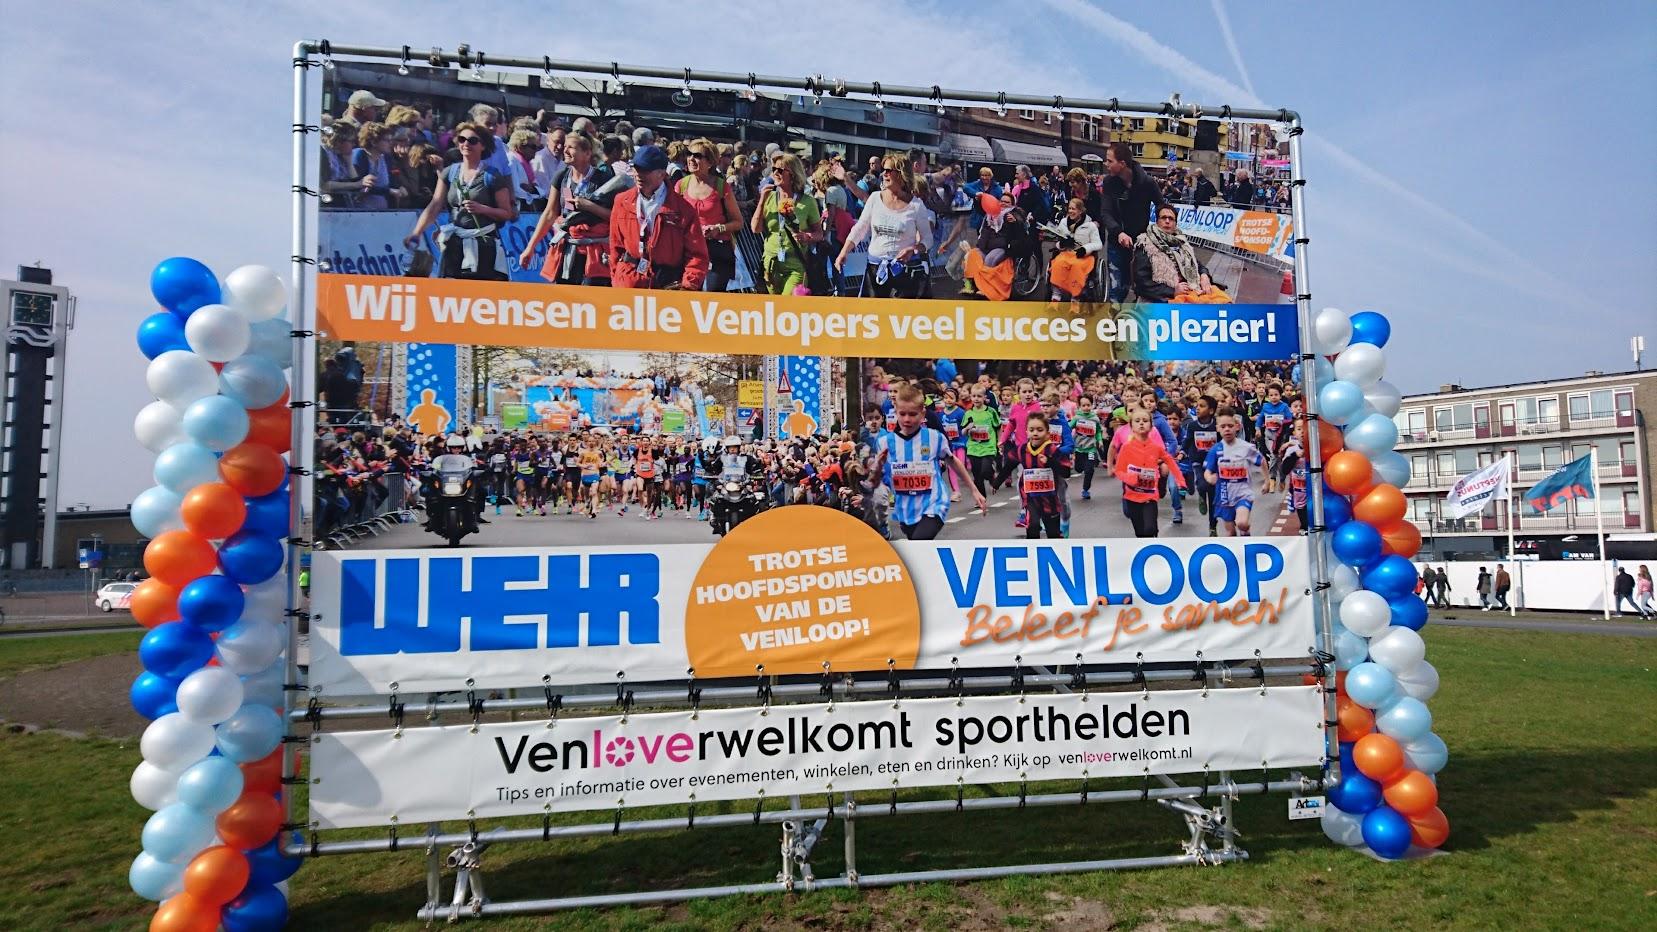 Venloop 2017